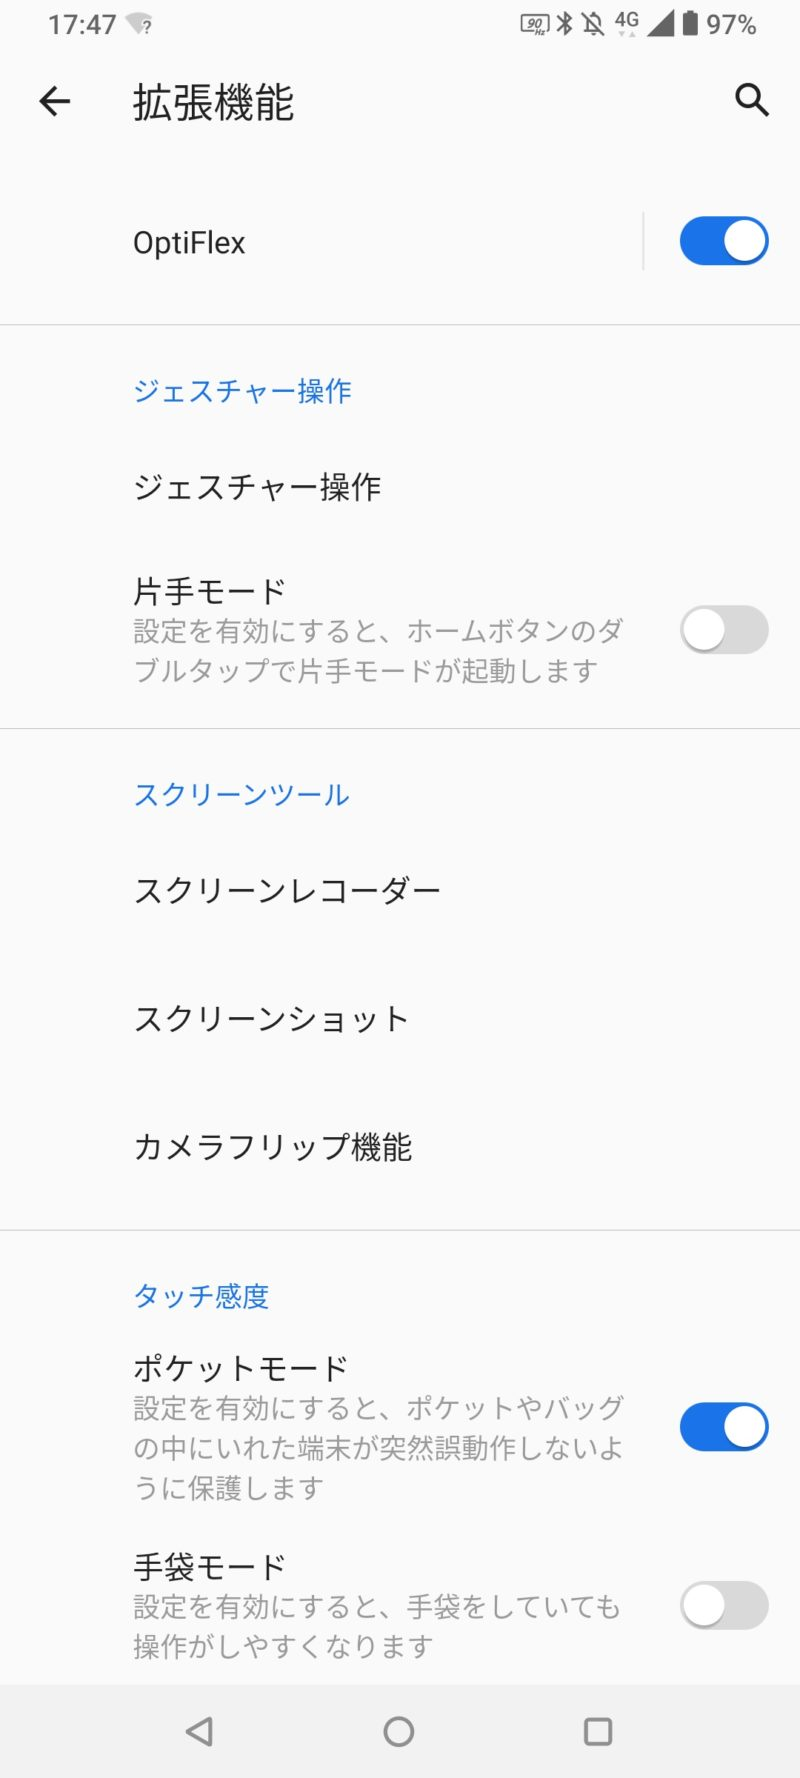 Screenshot 20201013 174753898 800x1778-「ASUS ZenFone 7」をレビュー!さらにハイスペックになって写真も動画ももっと楽しめる1台に